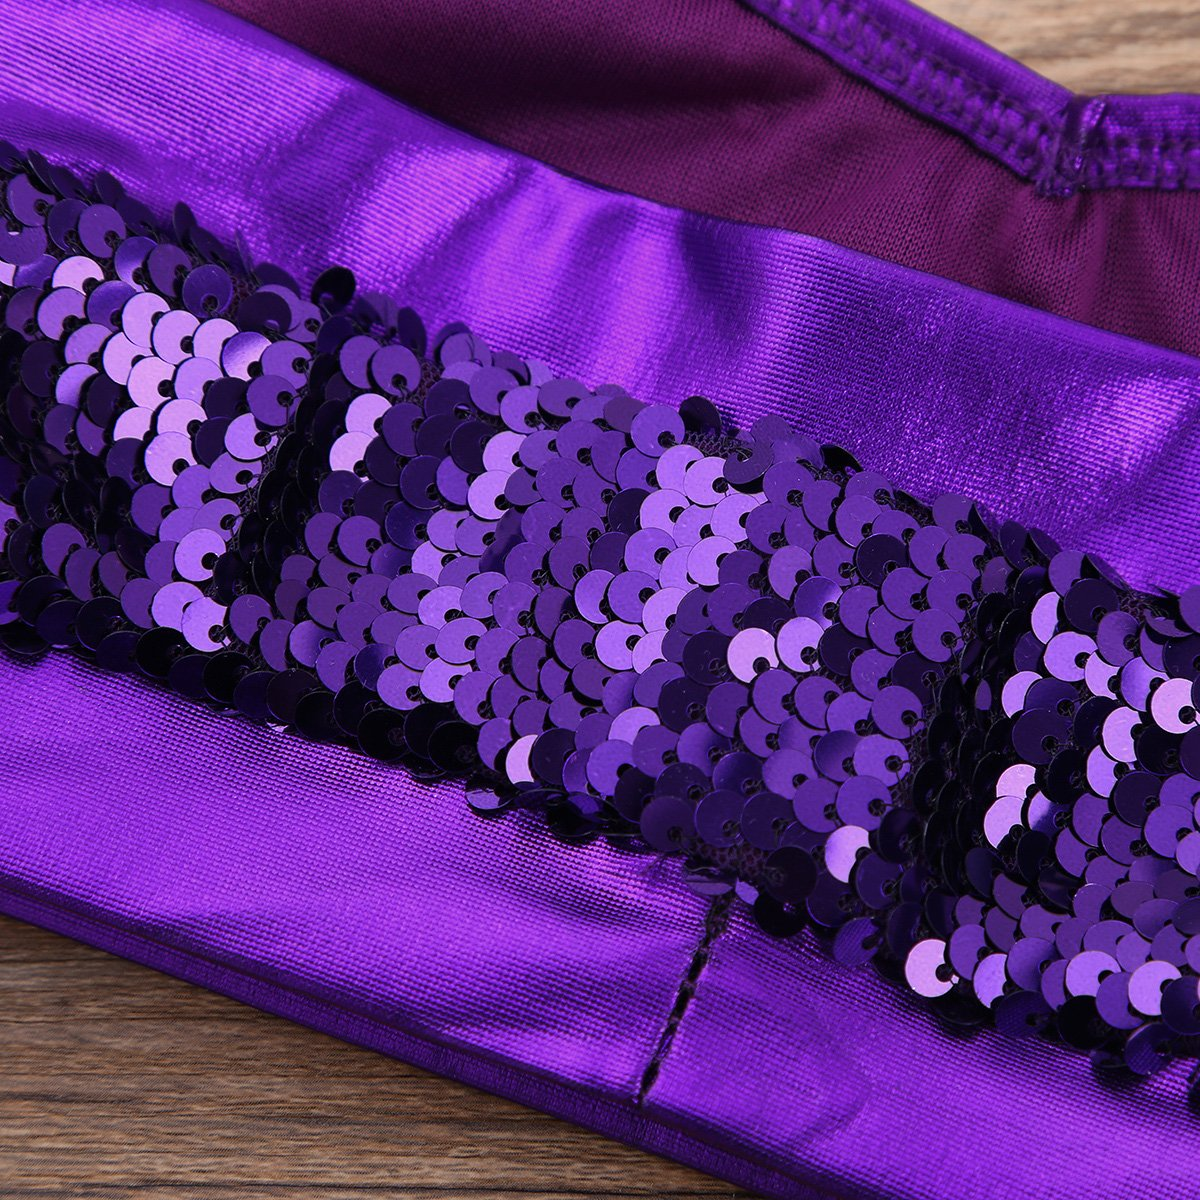 MSemis Kids Girls Glittery Sequins Halter Neck Crop Top Performance Ballet Dance Dancewear Athletic Sports Bra